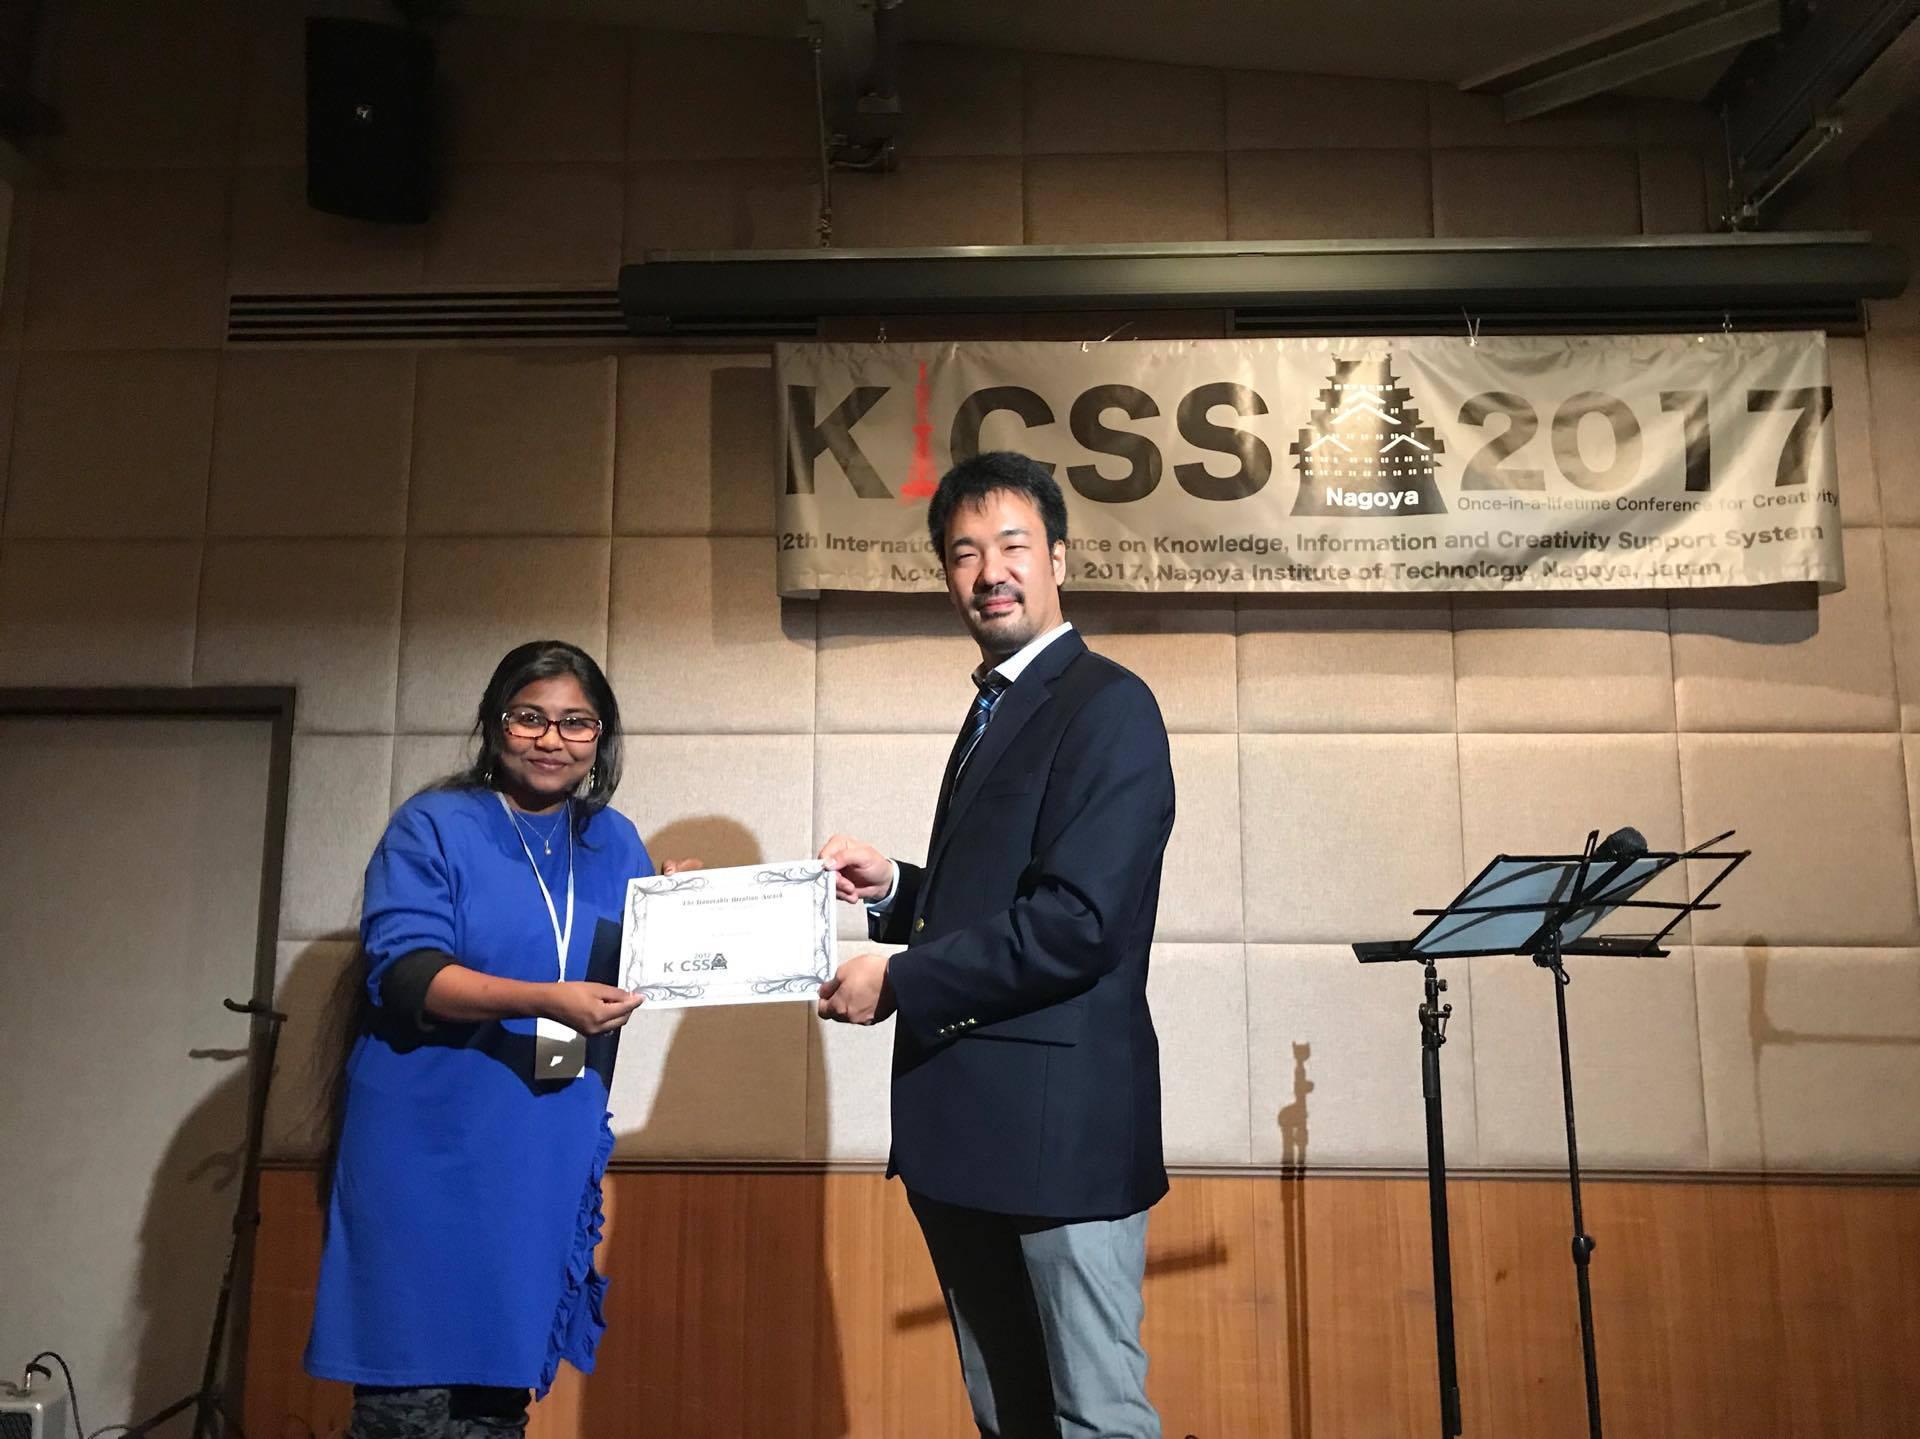 kicss2017-nayeema1.jpg